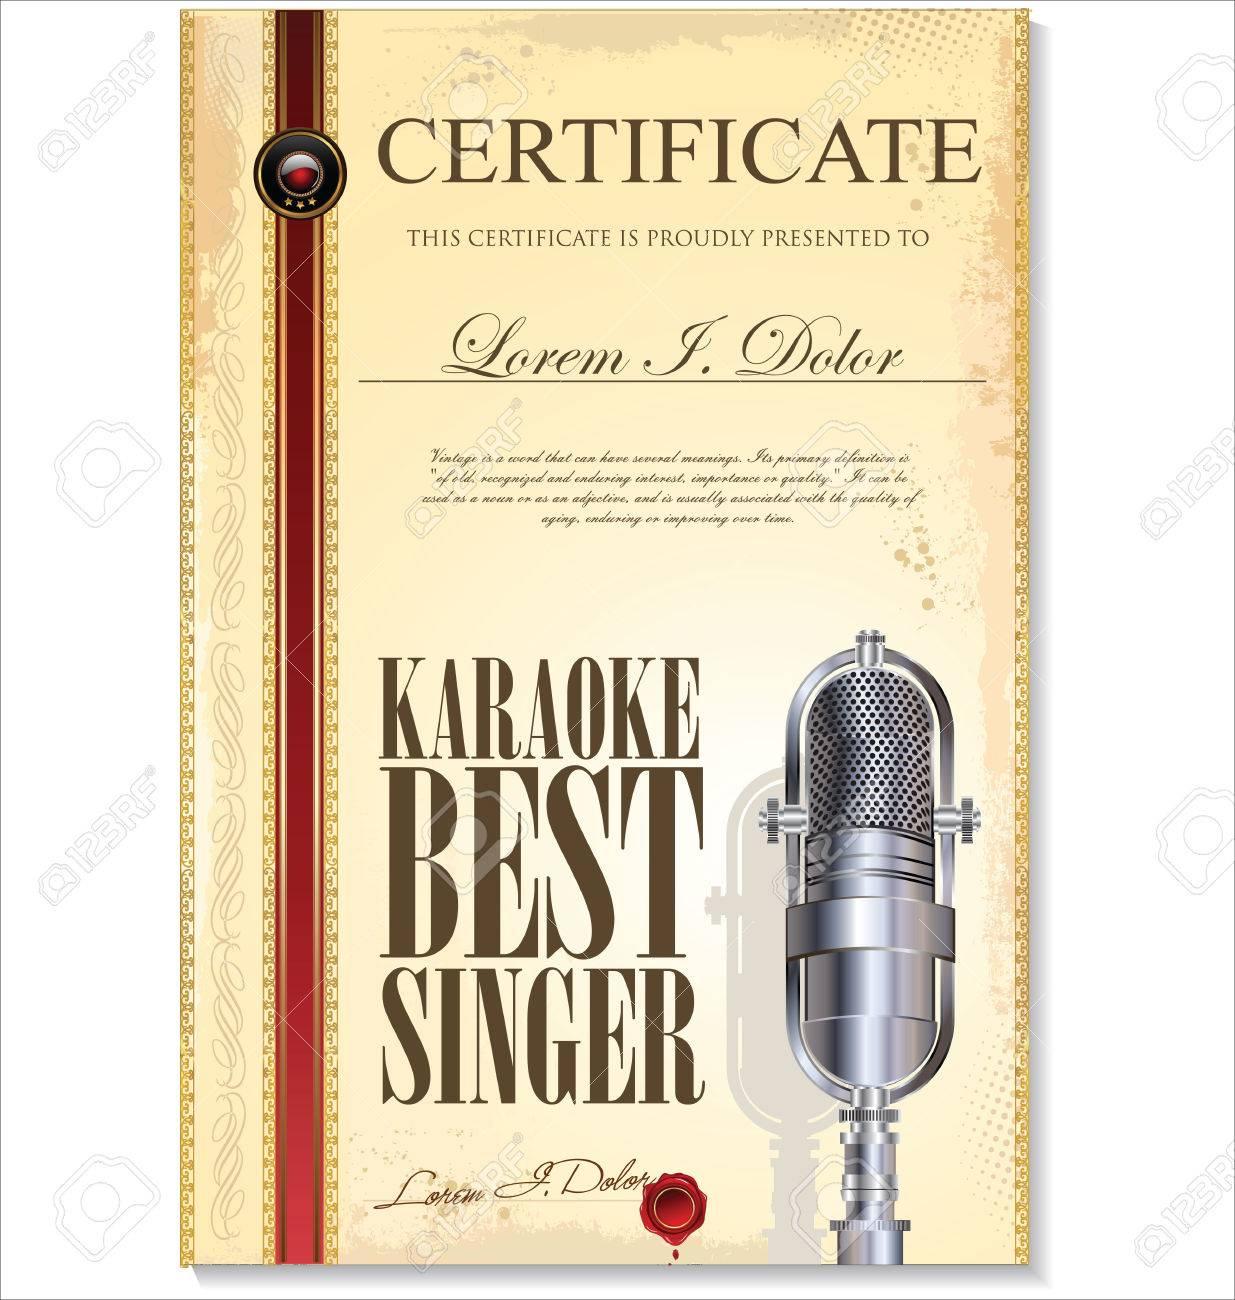 Karaoke certificate template best singer royalty free cliparts karaoke certificate template best singer stock vector 23320072 yadclub Images